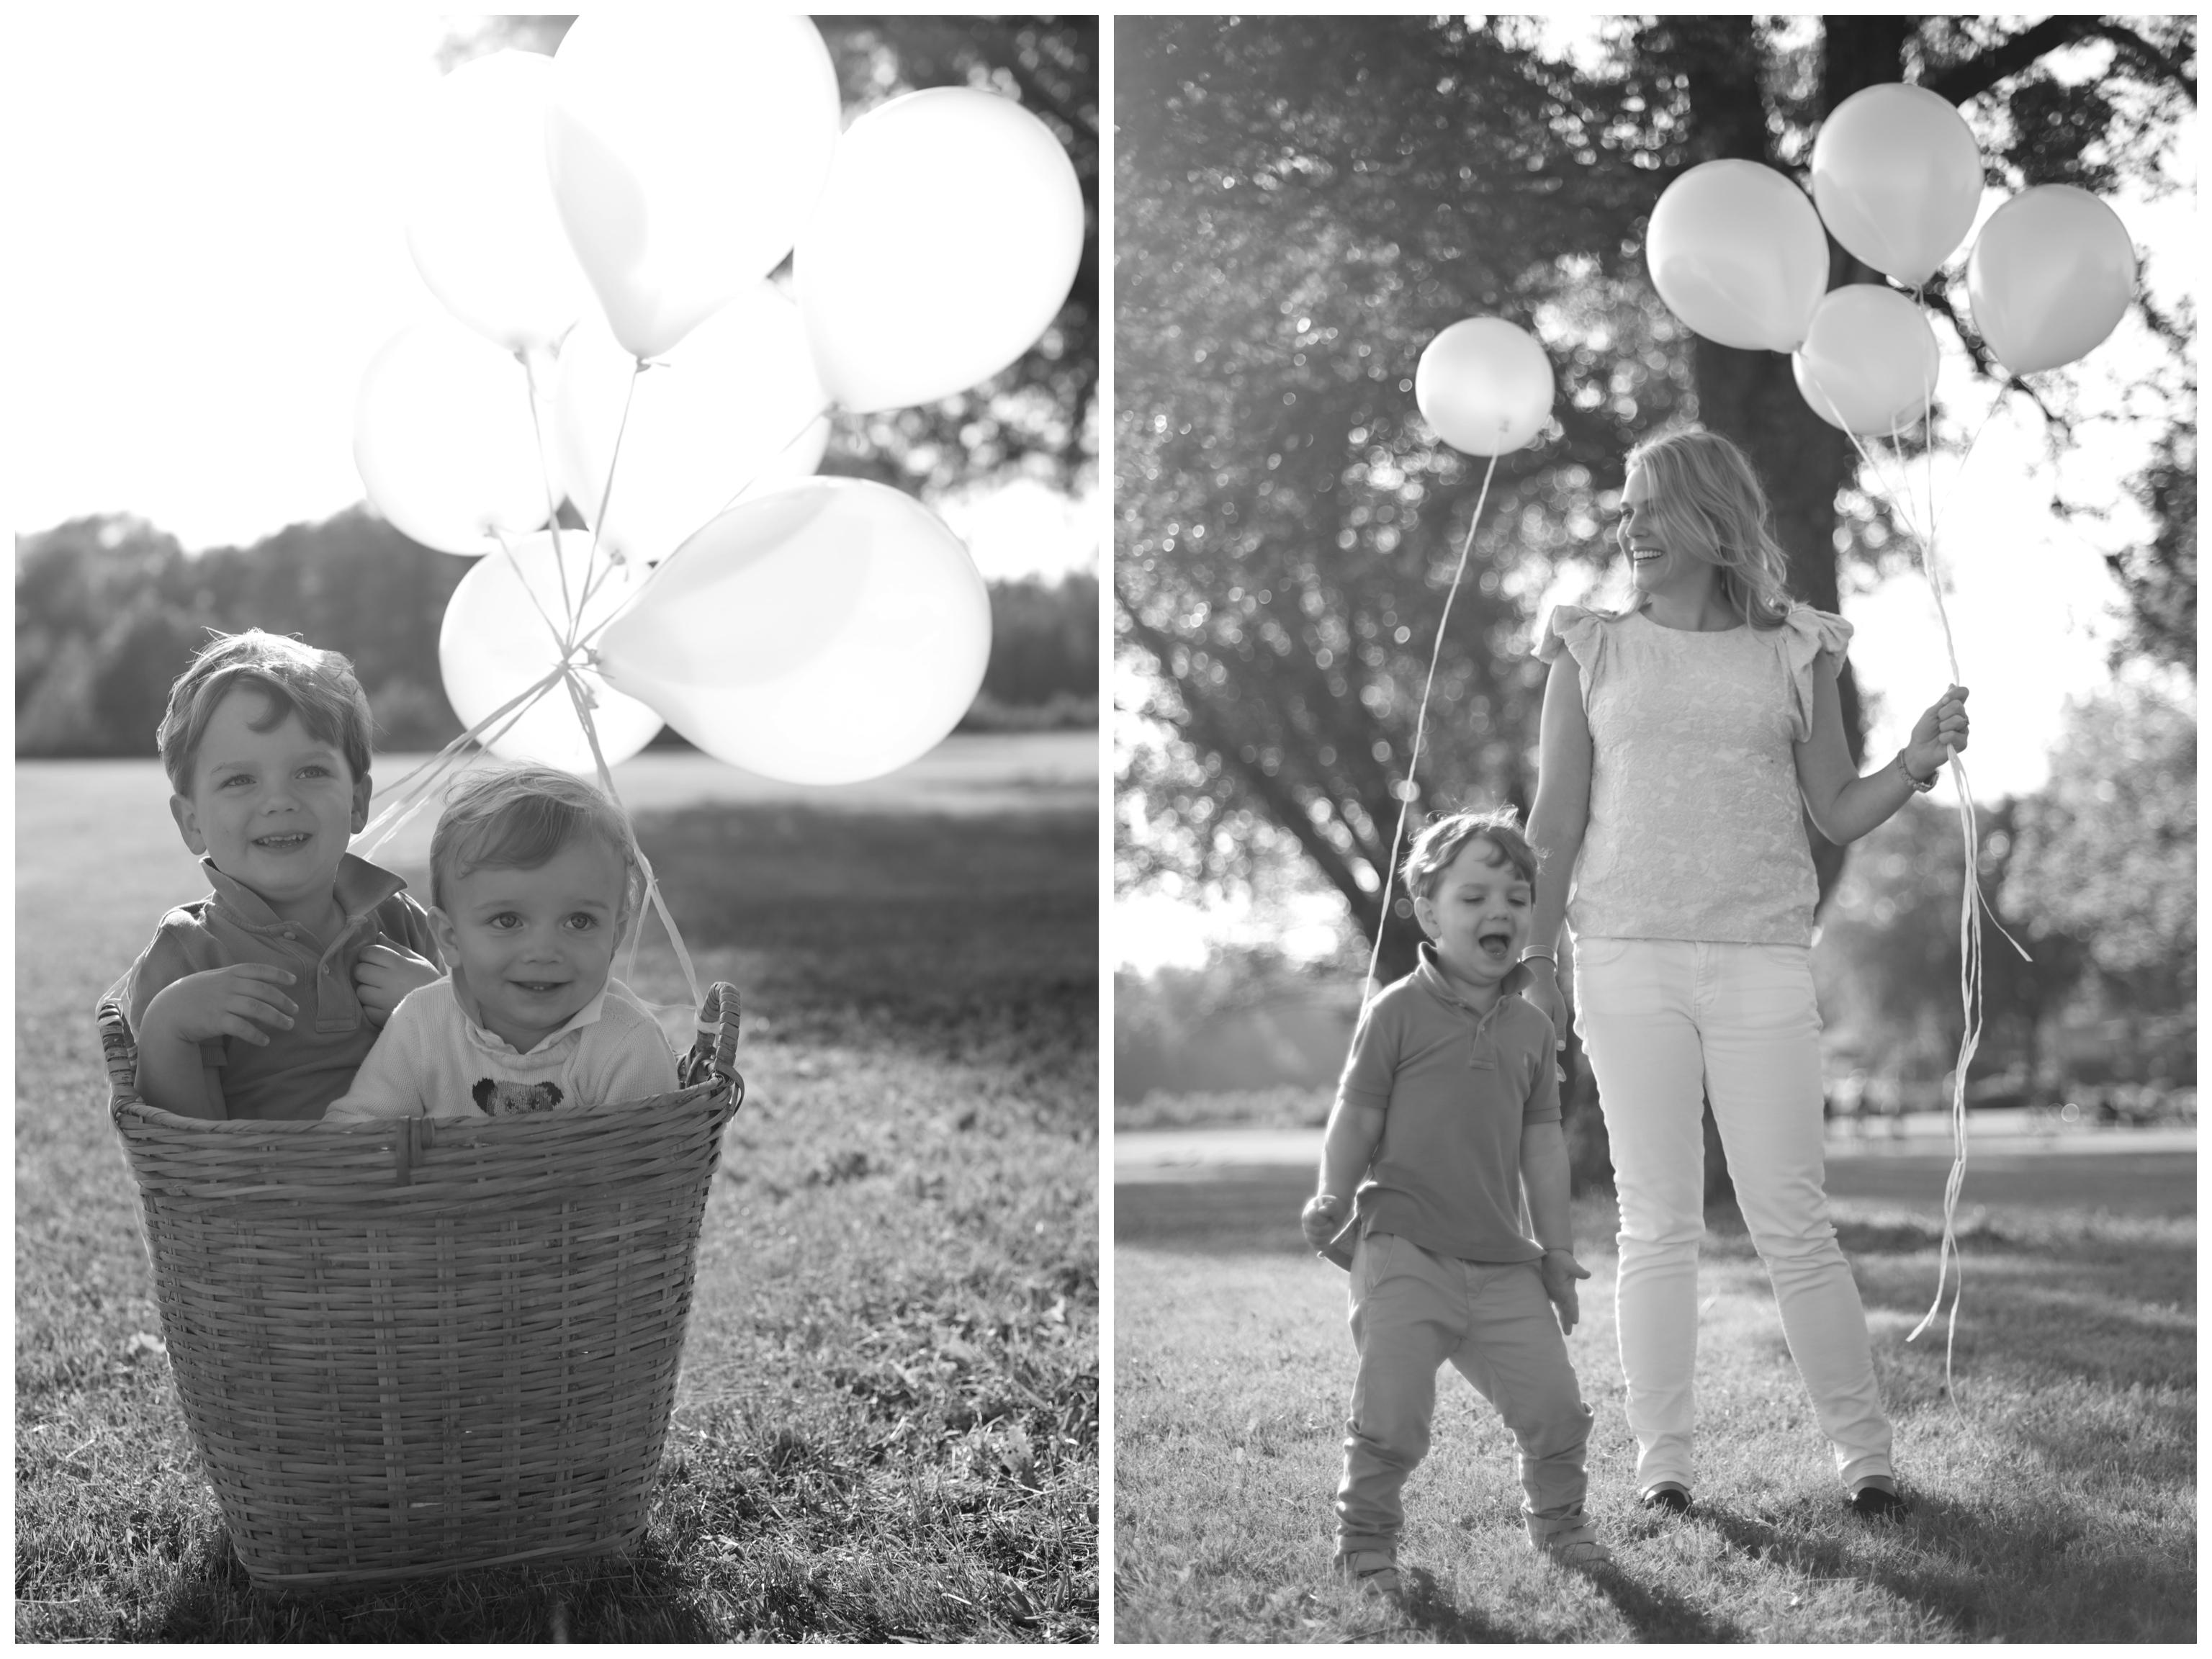 Familjefotografering med ballonger Barnfotograf i Stockholm